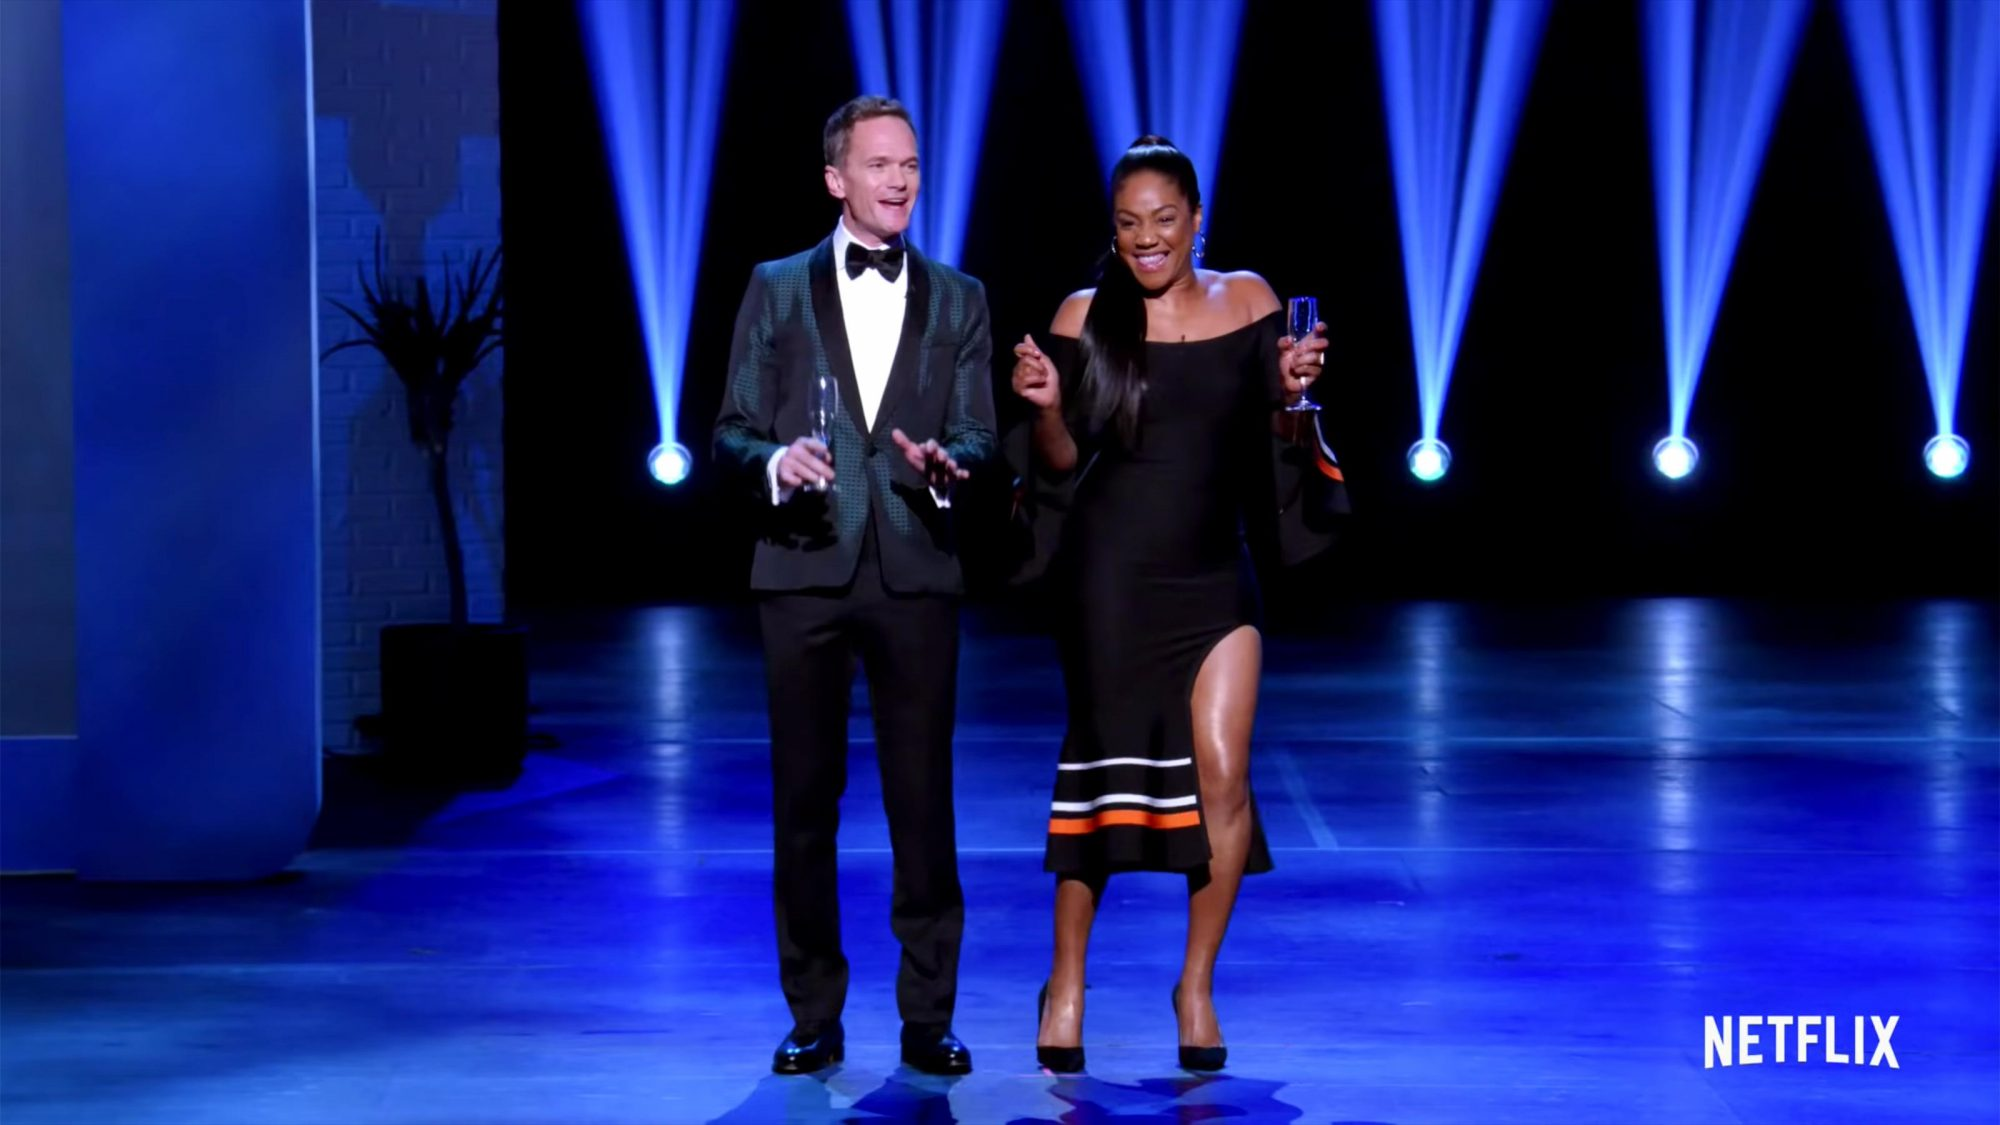 Still LAUGH-IN: The Stars Celebrate | Trailer | Netflix Comedy Special (screen grab) Neil Patrick Harris, Tiffany Haddish https://www.youtube.com/watch?v=W8rChpLYf_Q CR: Netflix